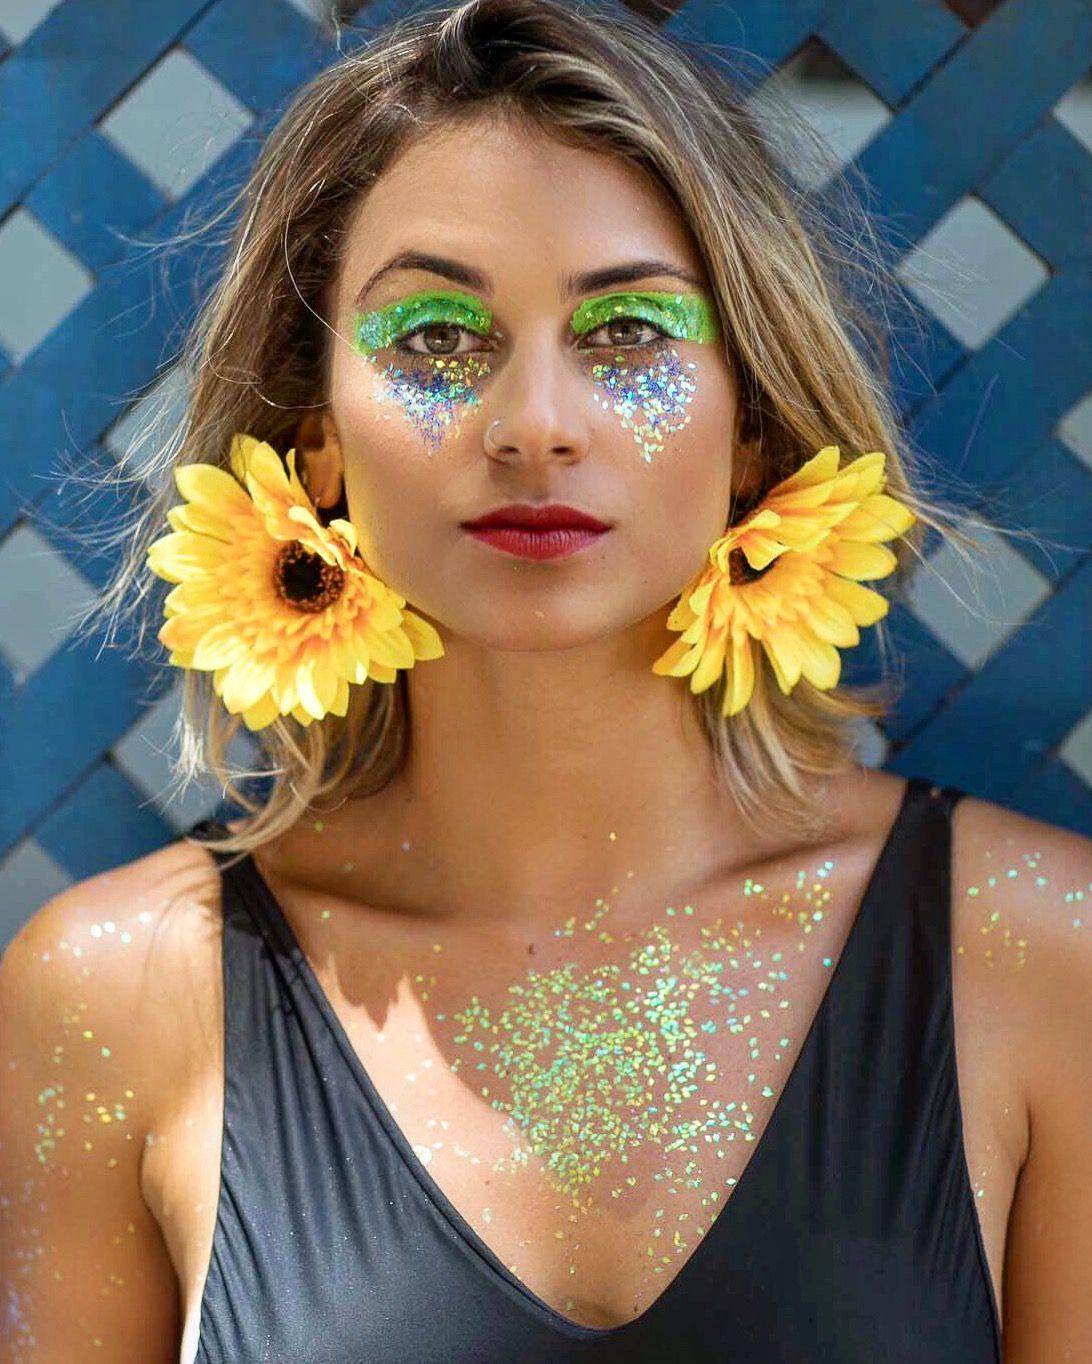 Resultado de imagem para fantasia carnaval glitter